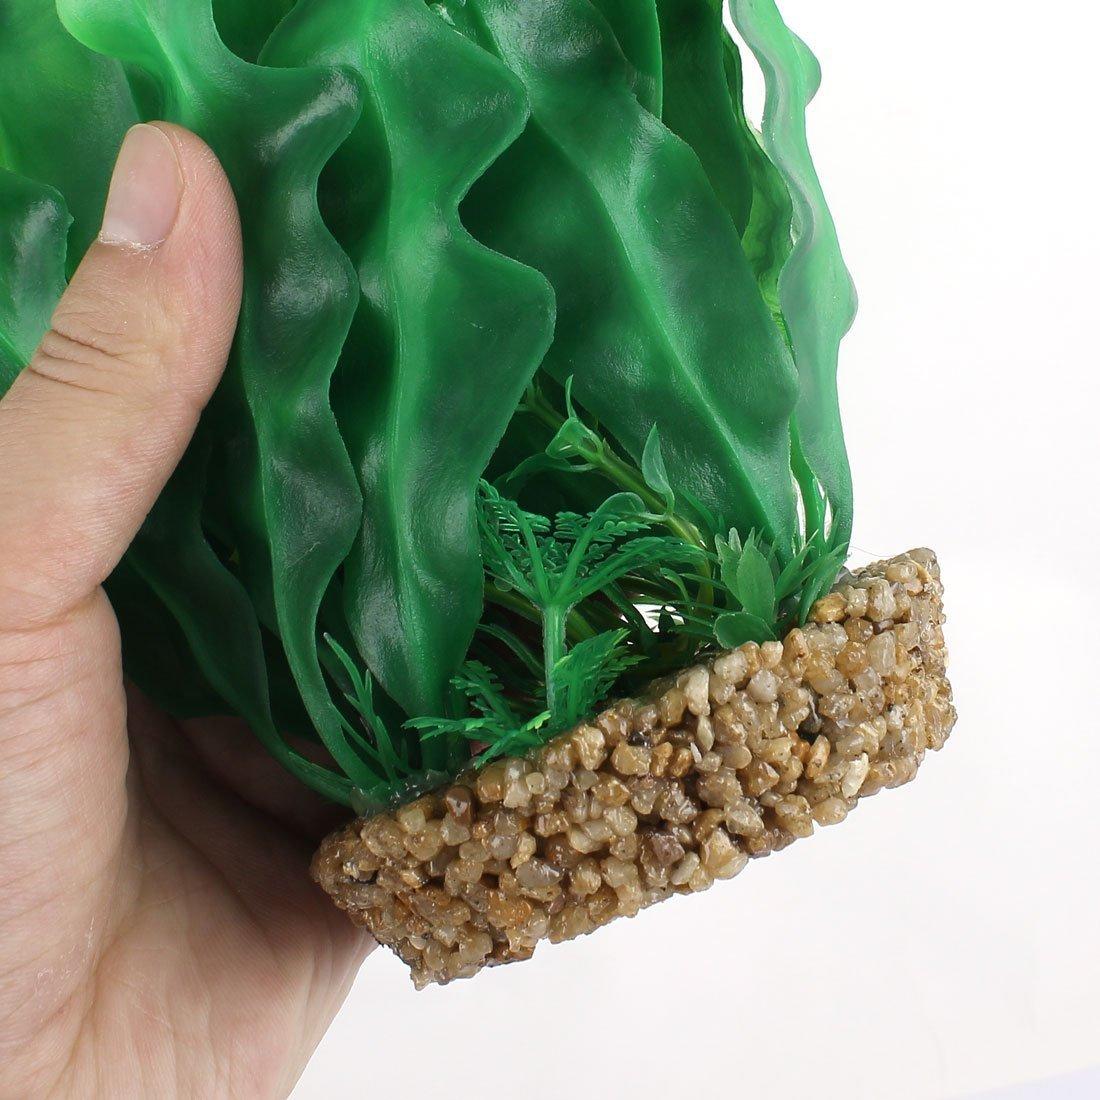 Amazon.com : eDealMax hoja de plástico decoración acuario Planta de agua Artificial DE 23 cm Alto Verde : Pet Supplies